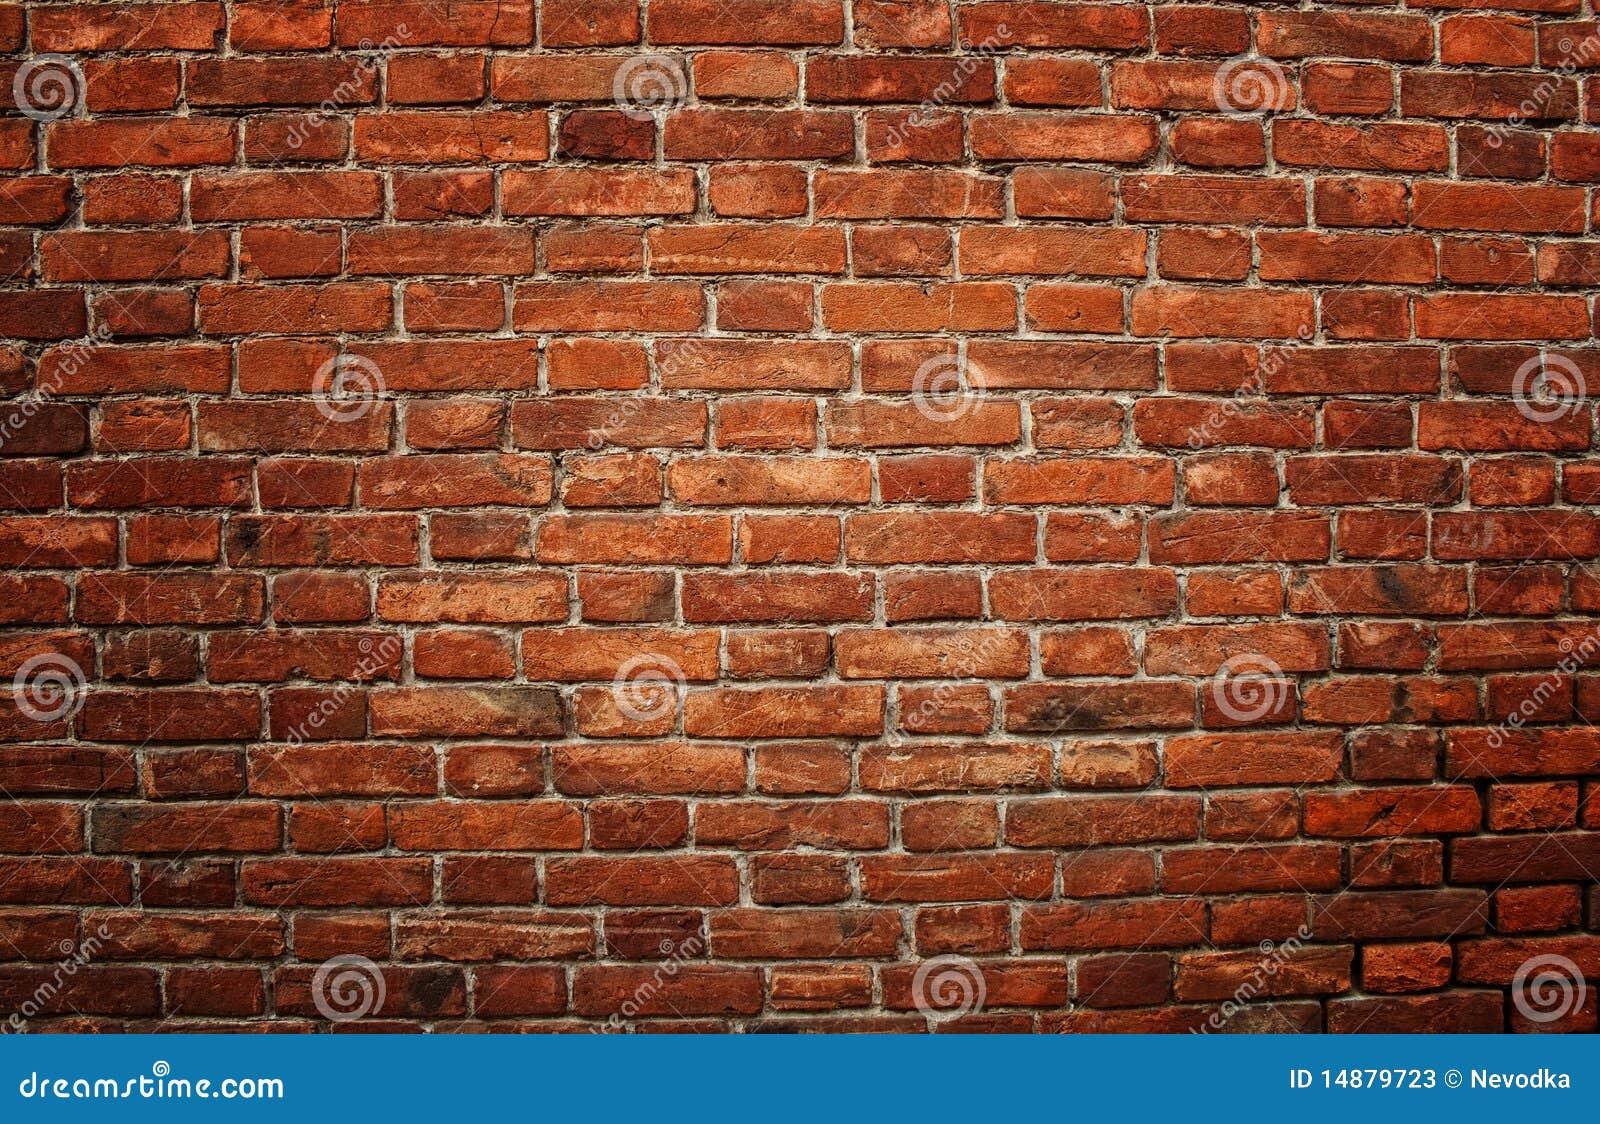 Old Brick Wall Stock Photos Image 14879723